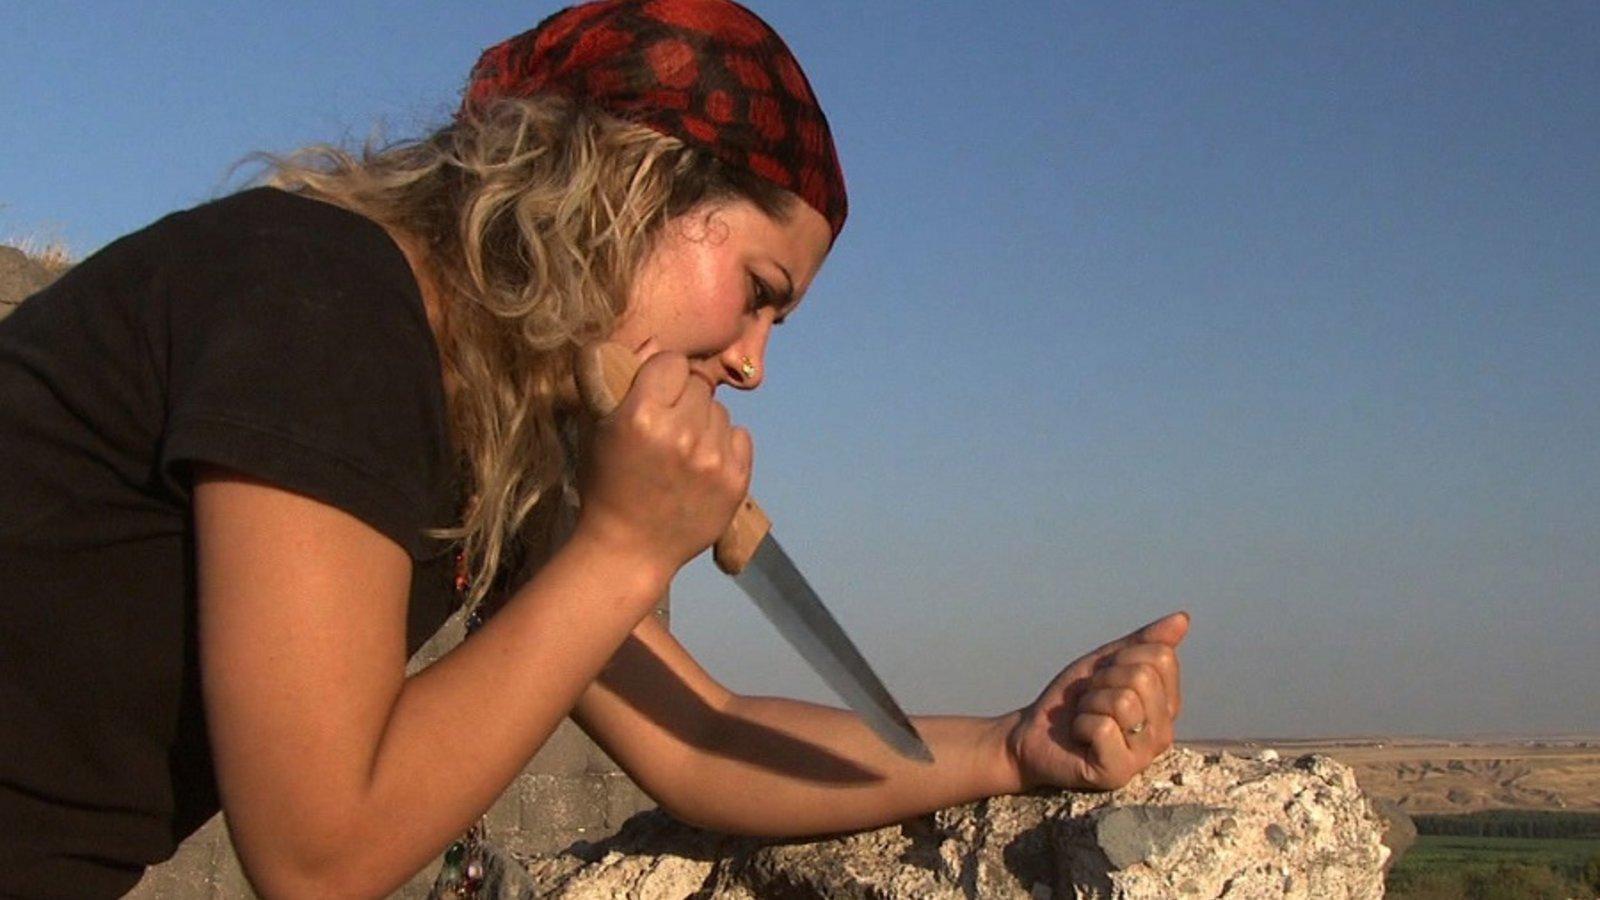 Dishonorable Killings - Honor Killings of Women in Kurdistan